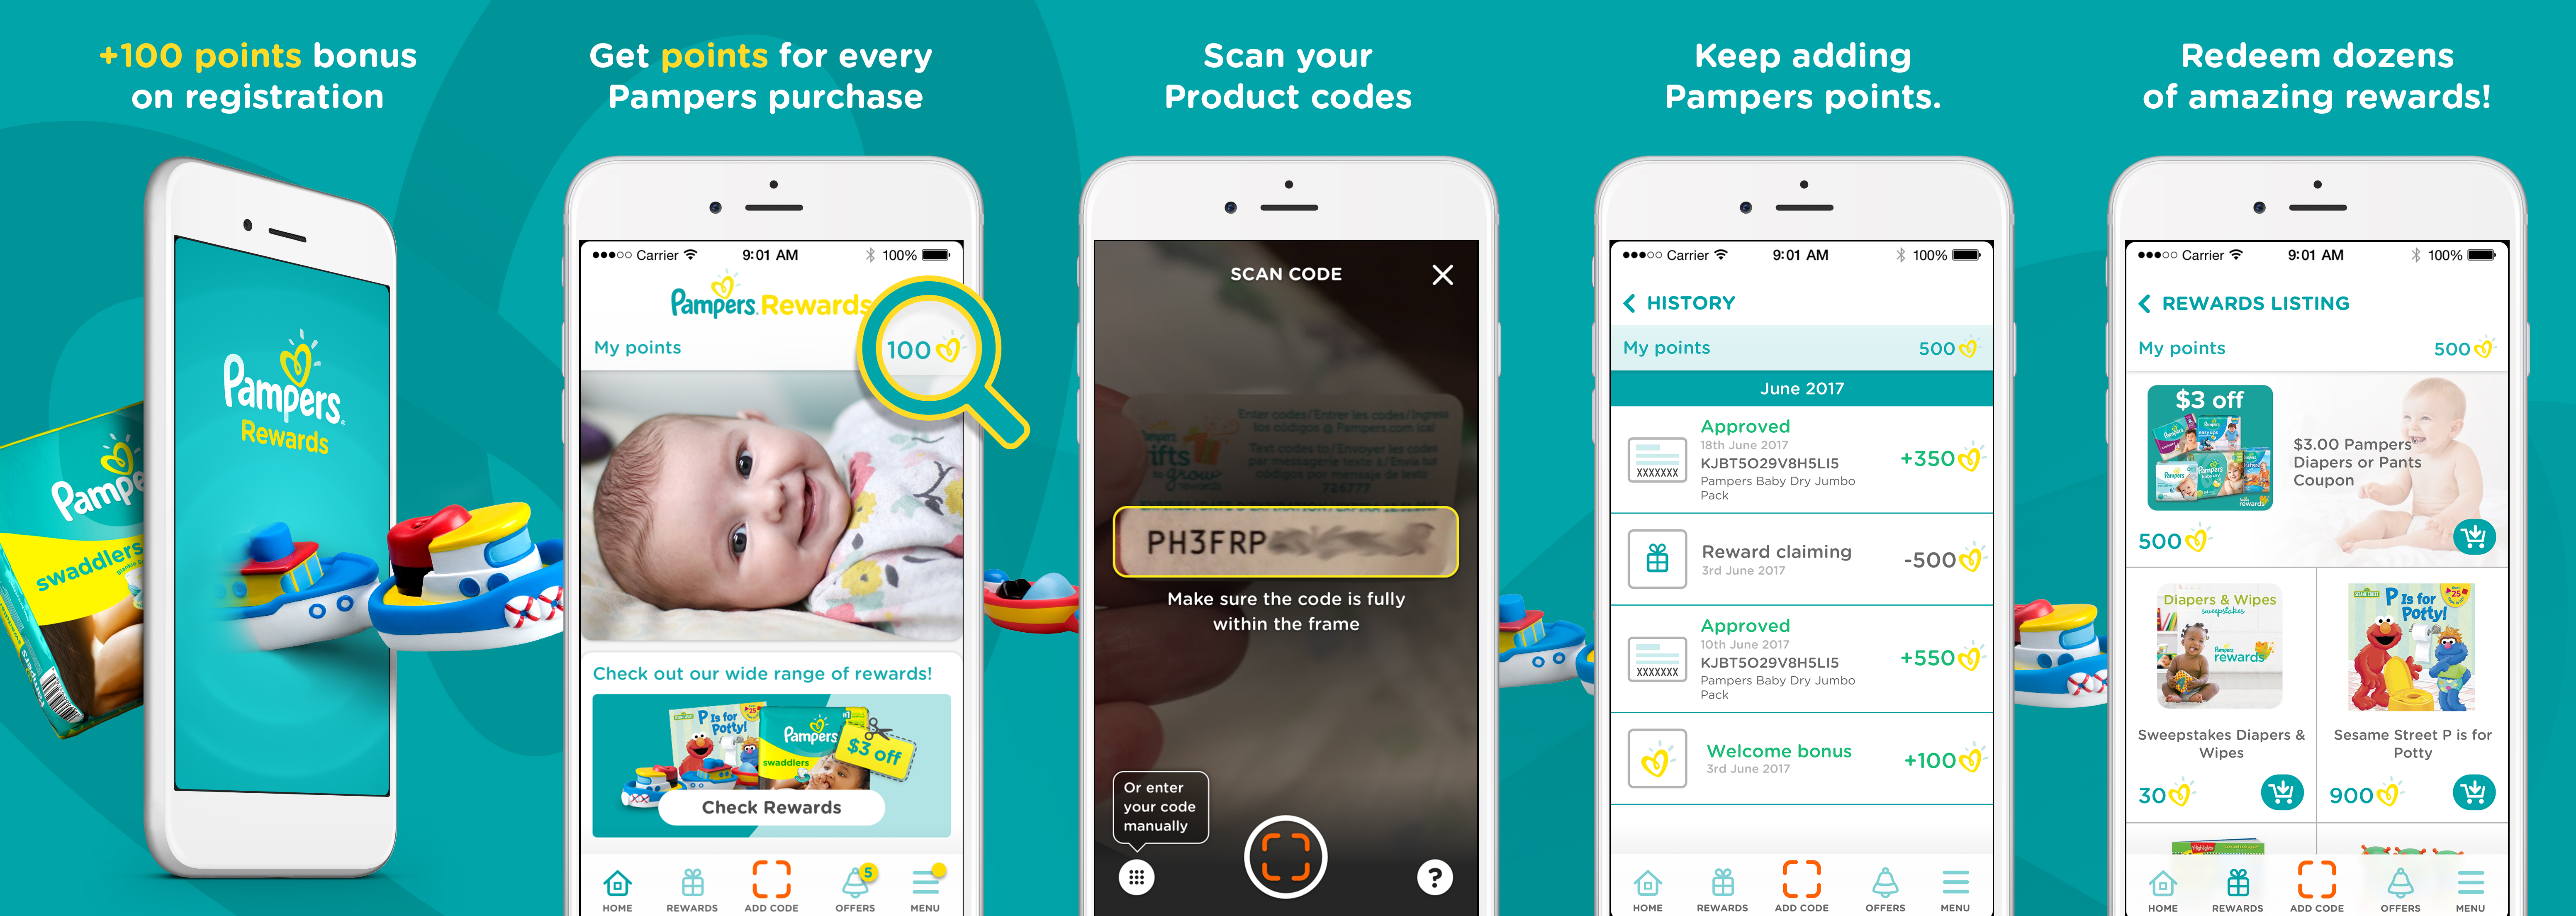 5 Summer Hacks for Mom and Baby - Pampers Rewards App // thislilpiglet.net